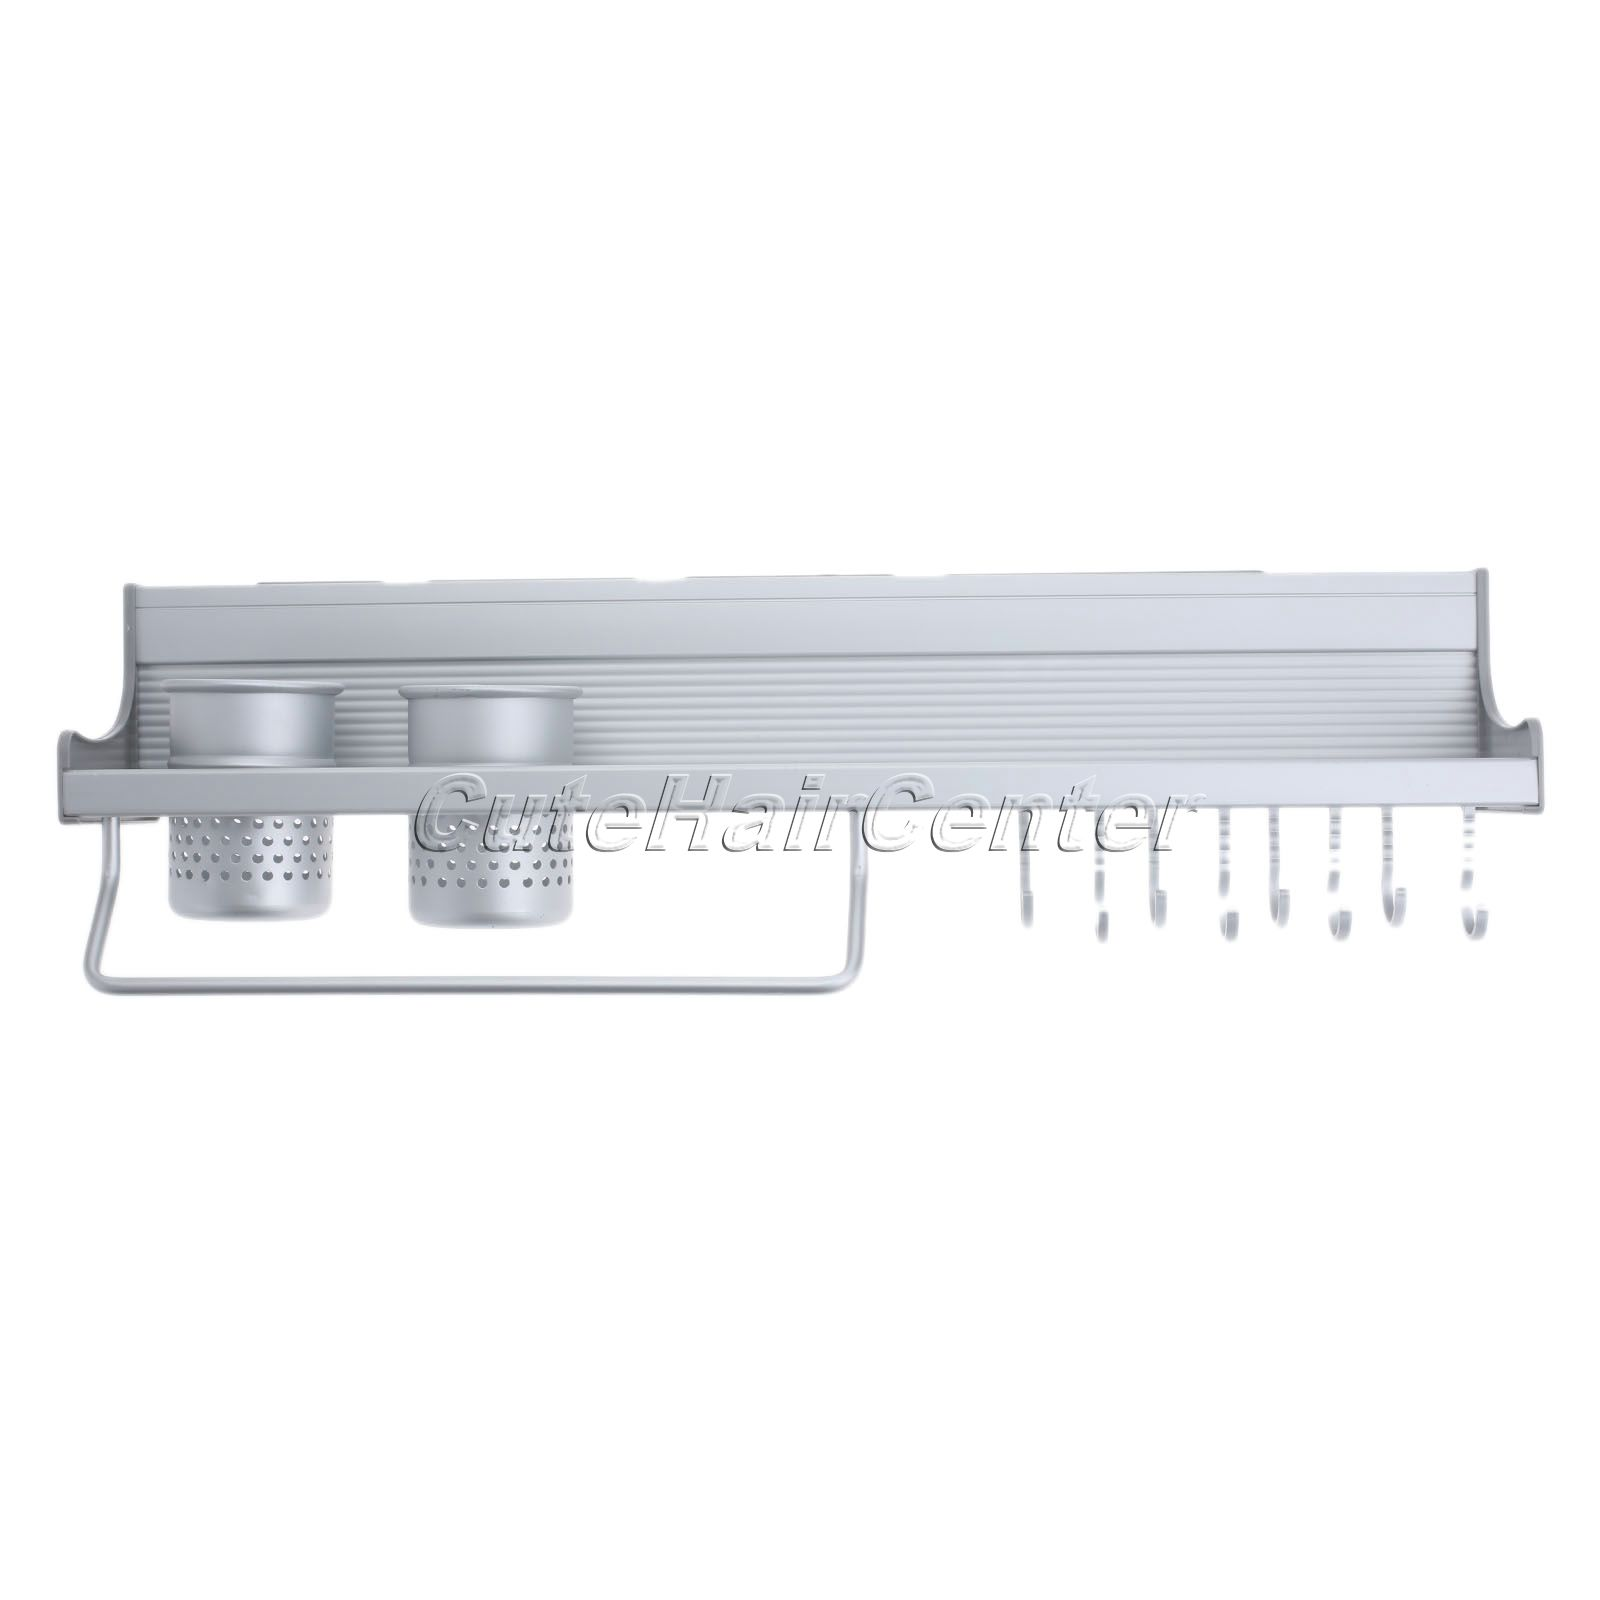 Free Shipping Aluminium Kitchen Storage Shelf Rack Spice Tool Holder ...